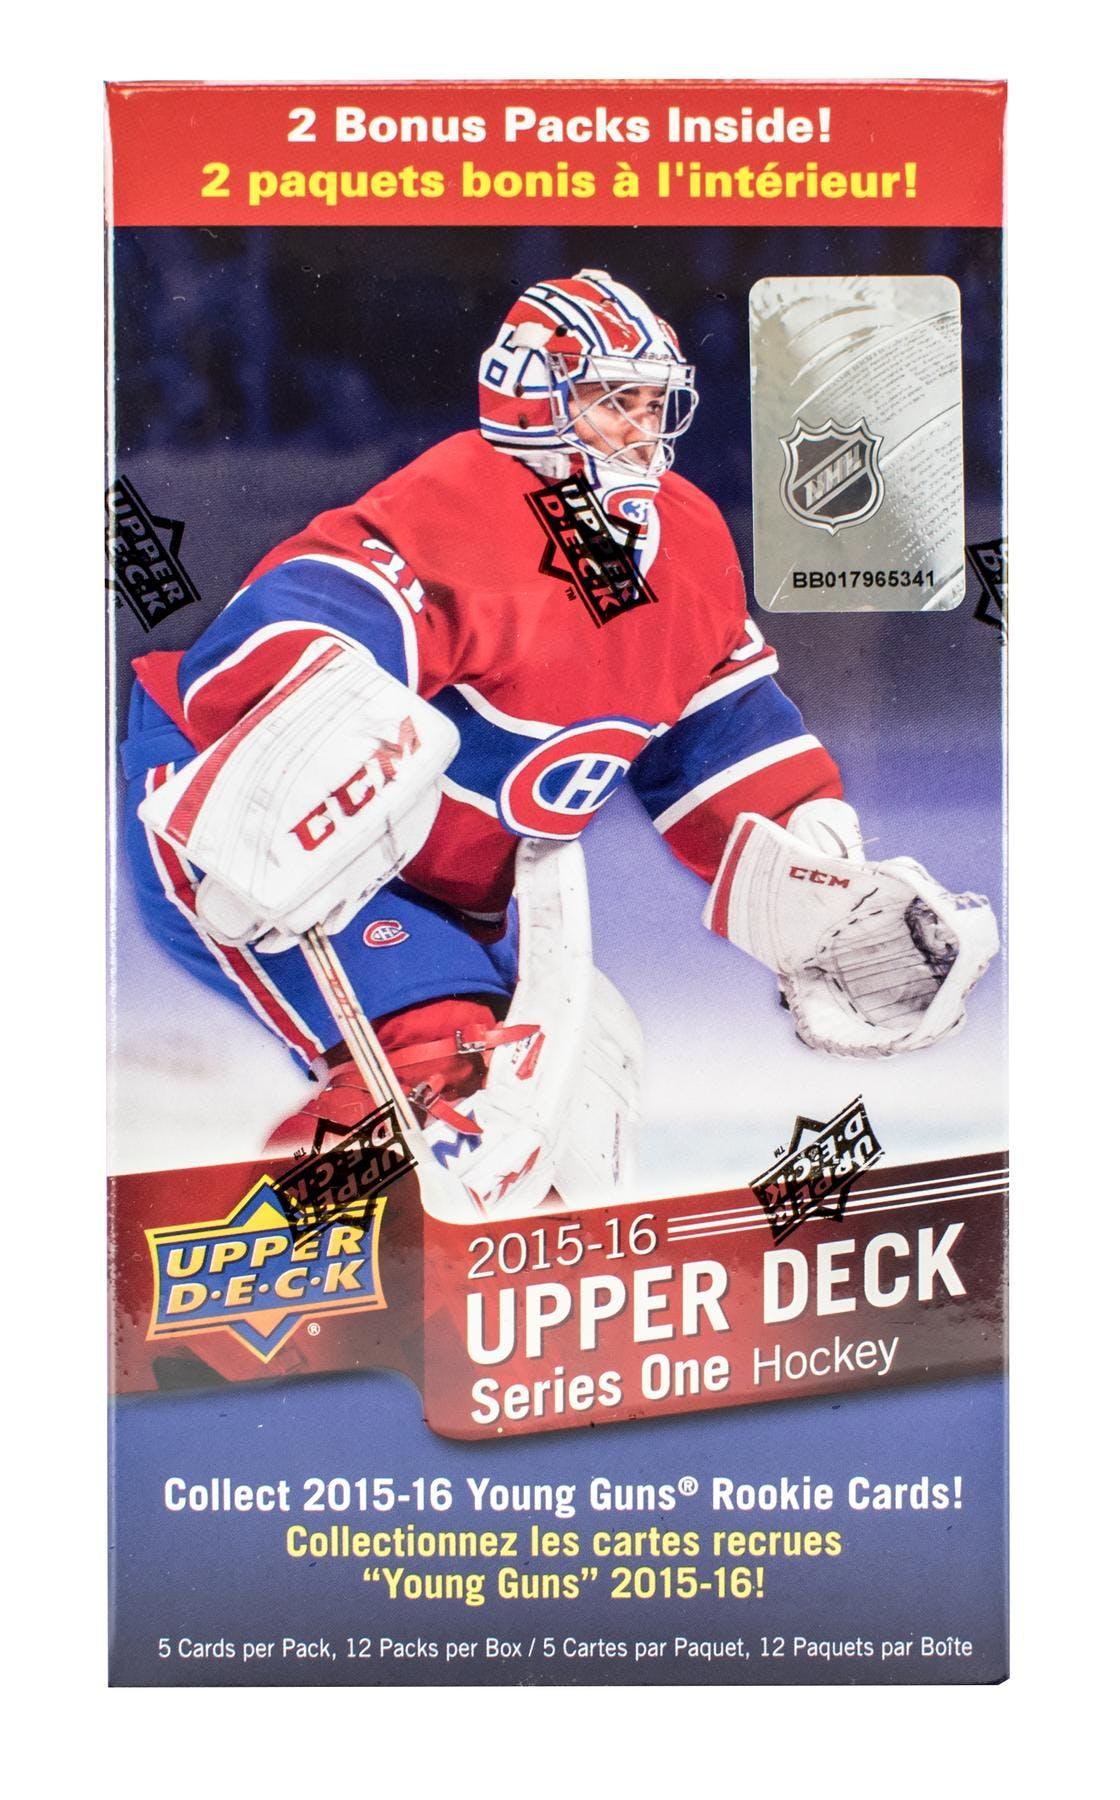 2015 16 Upper Deck Series 1 Hockey 12 Pack Blaster Box